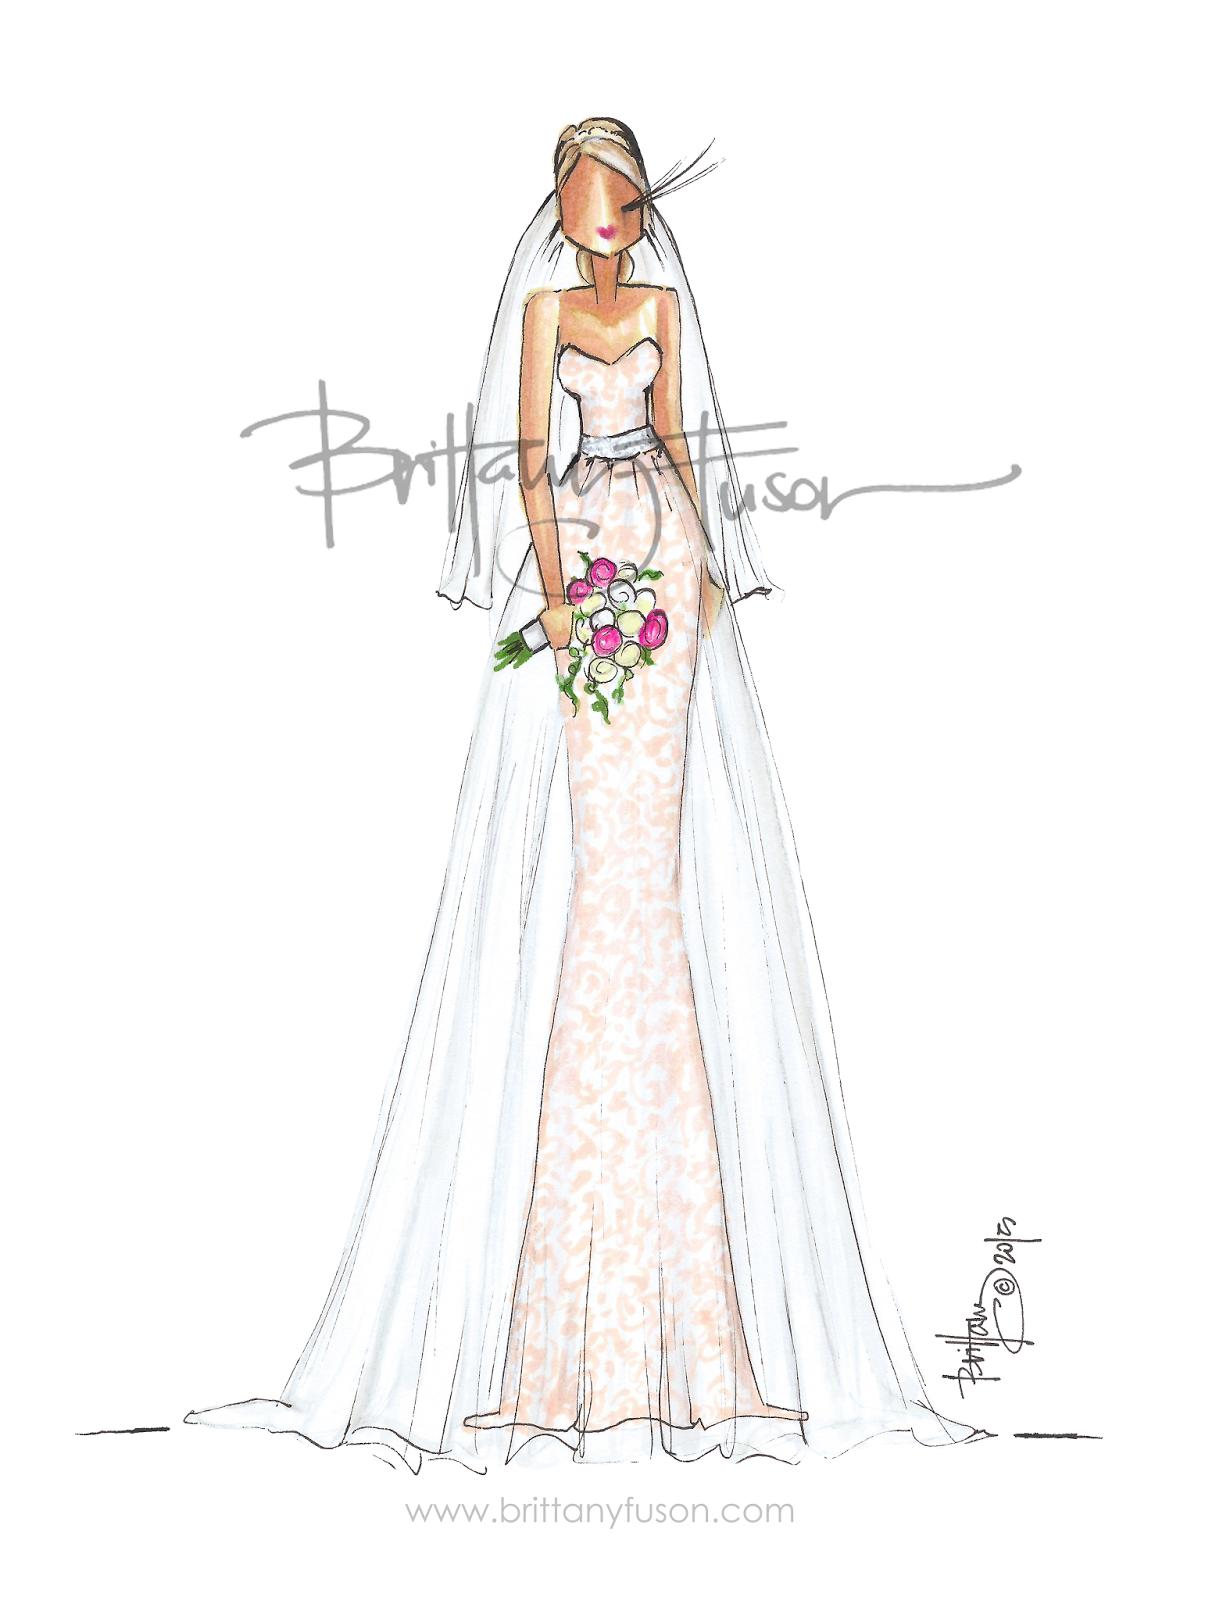 Brittany Fuson: Blushing Bride